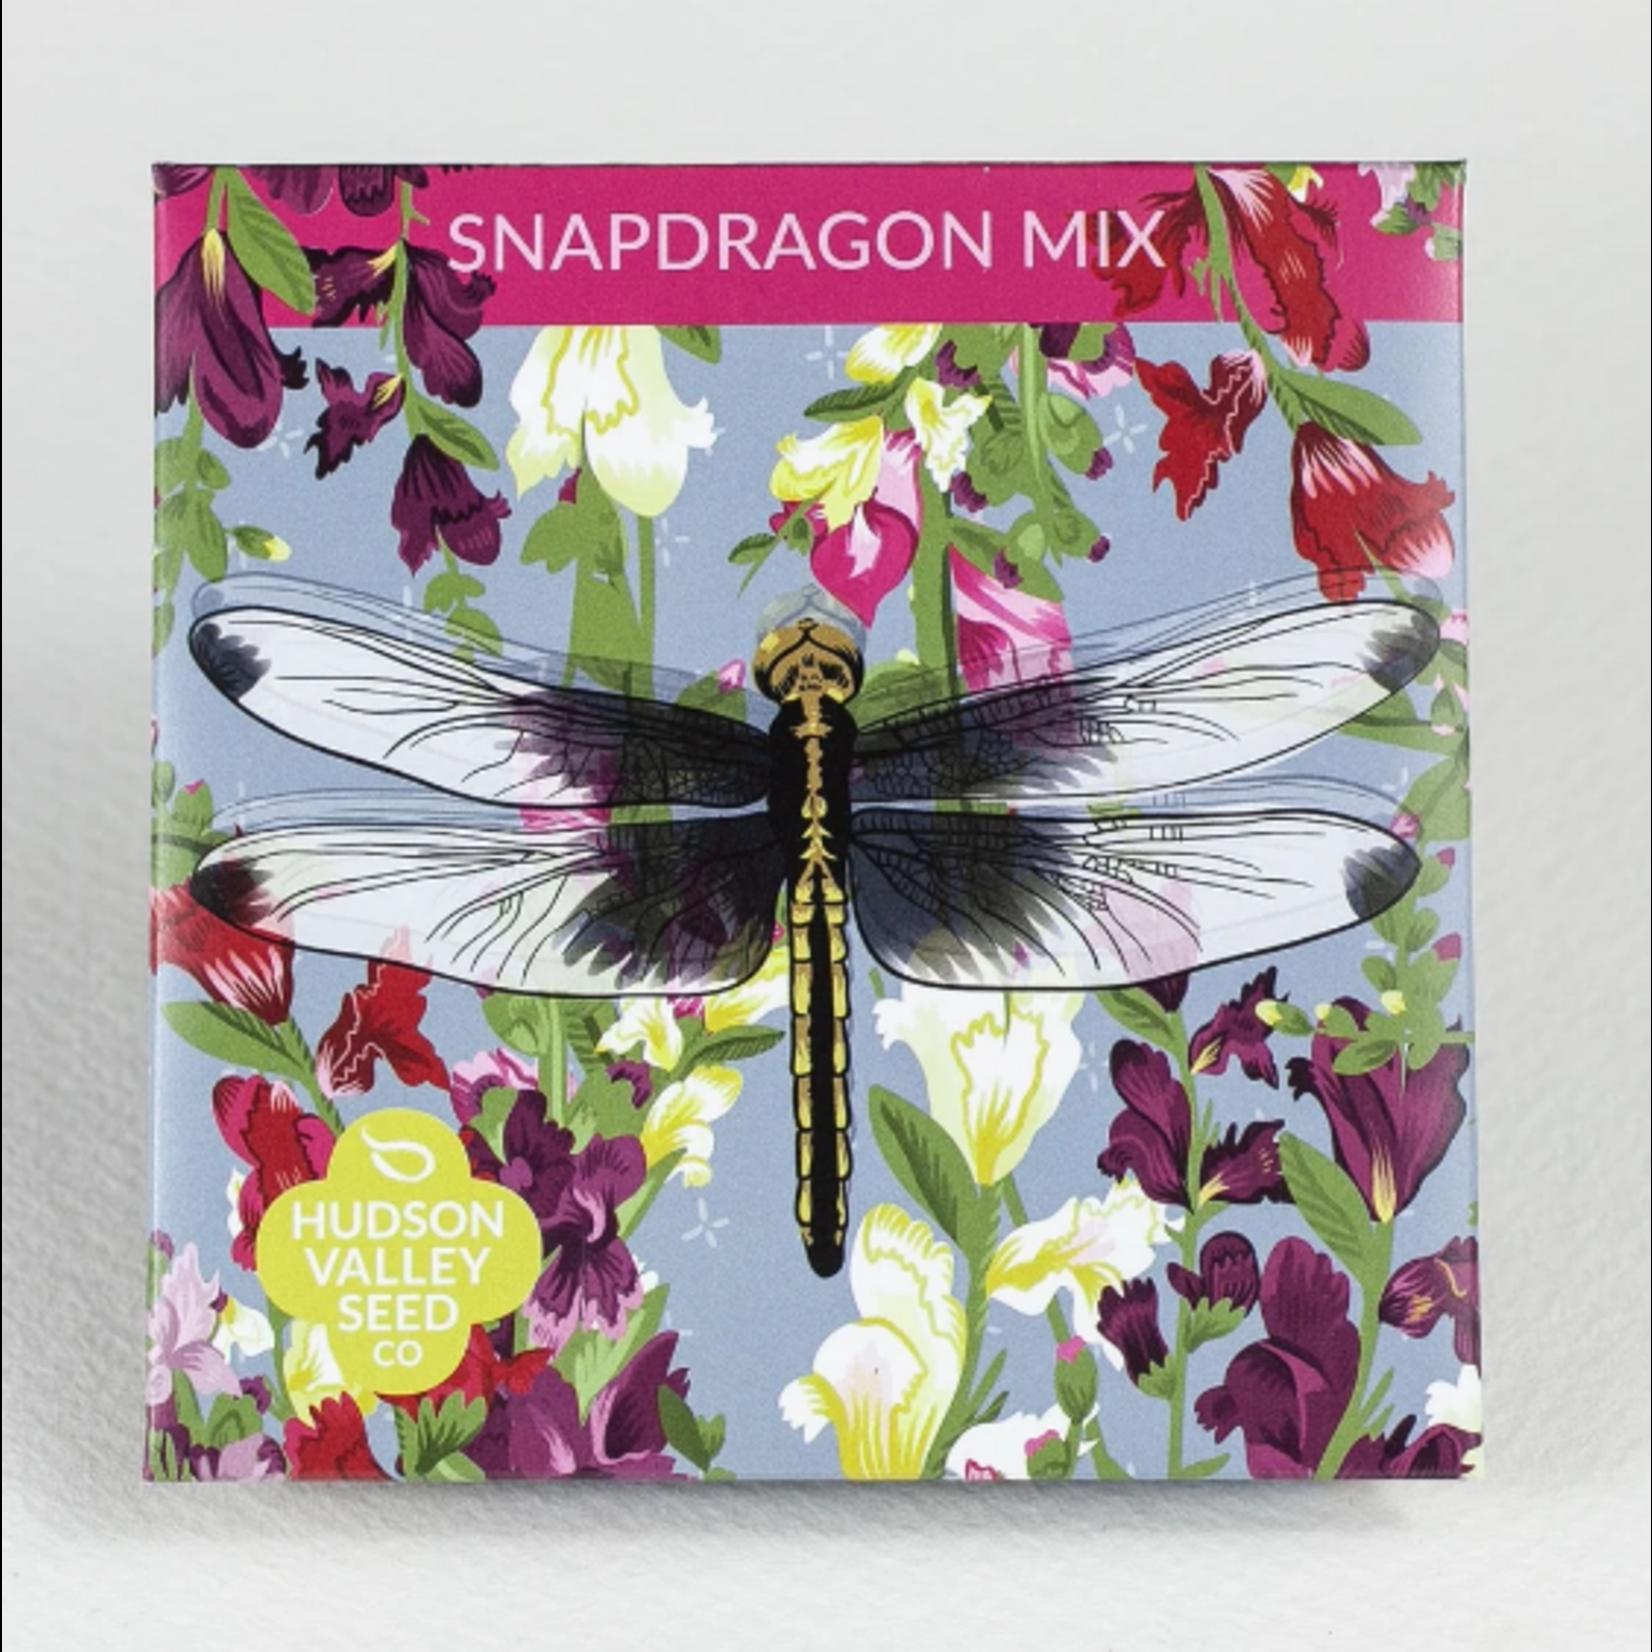 Hudson Valley Seeds Snapdragon Mix Seeds